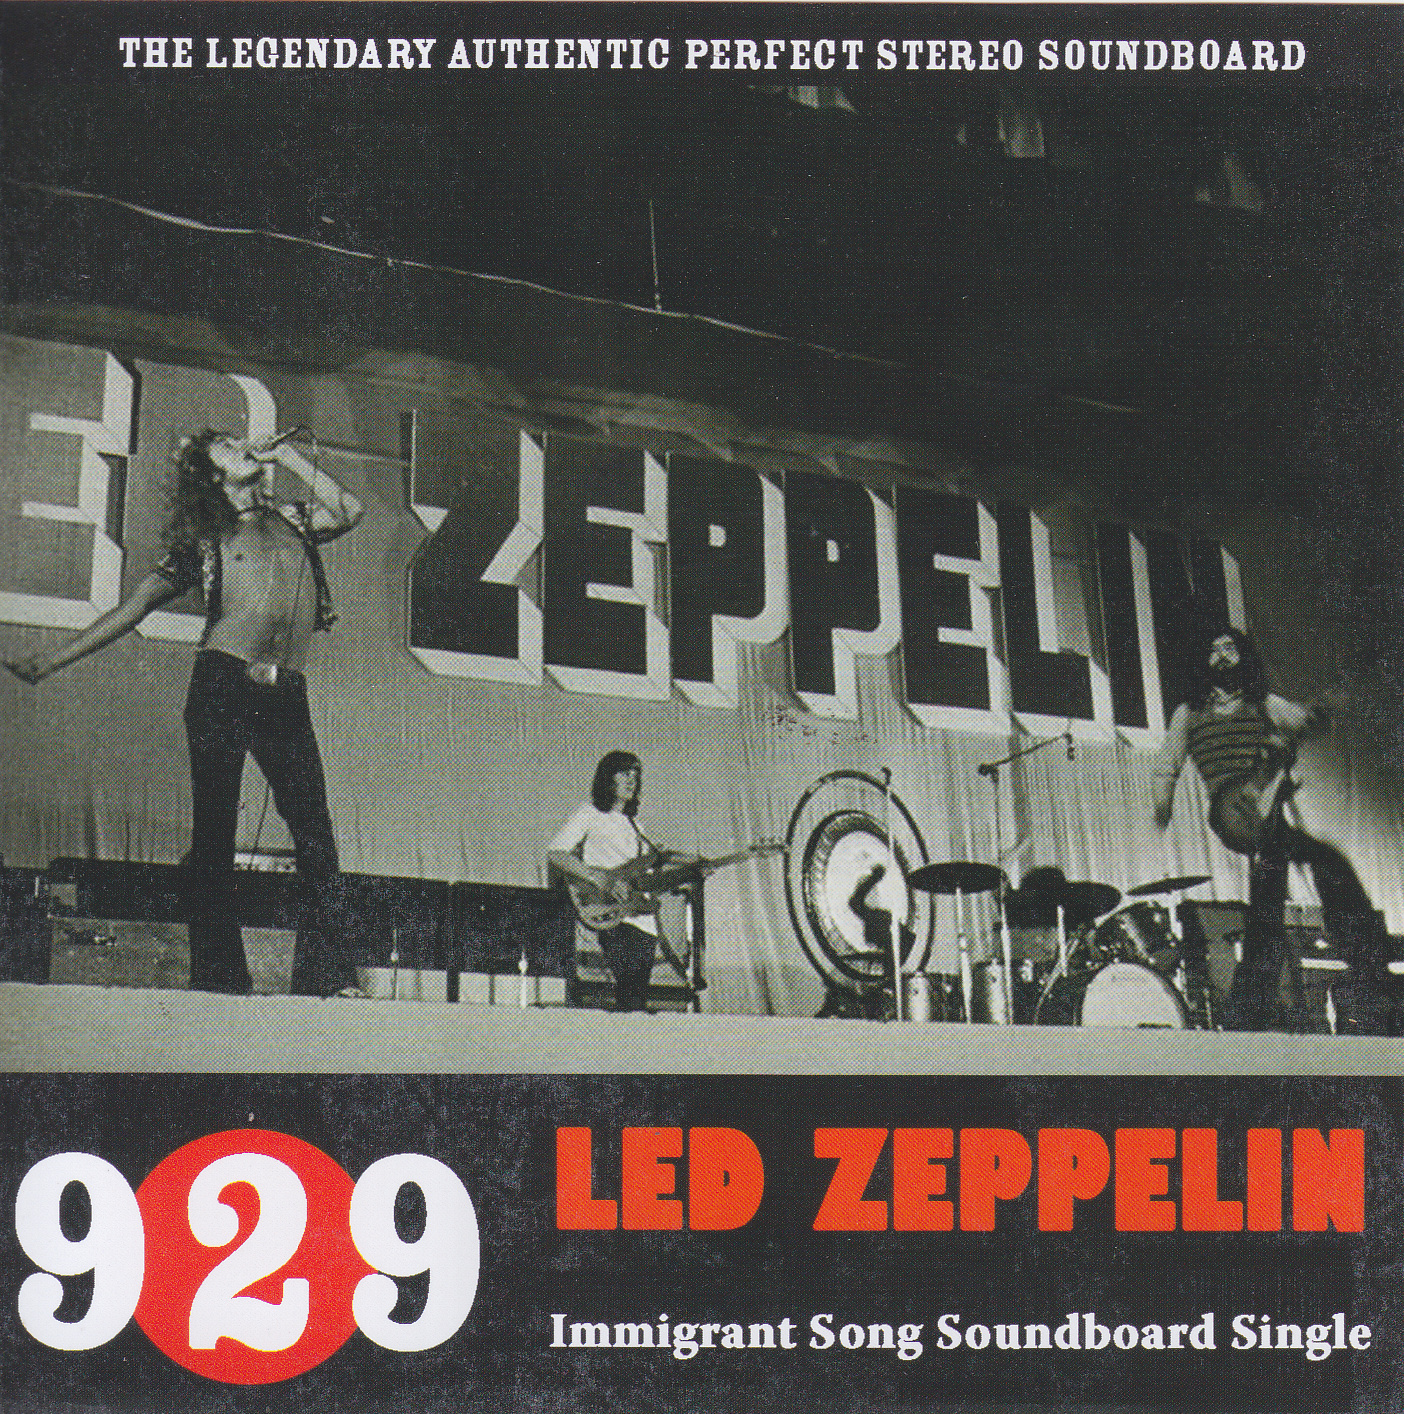 Led Zeppelin 929 Immigrant Song Soundboard Single 1Single CD Non Label